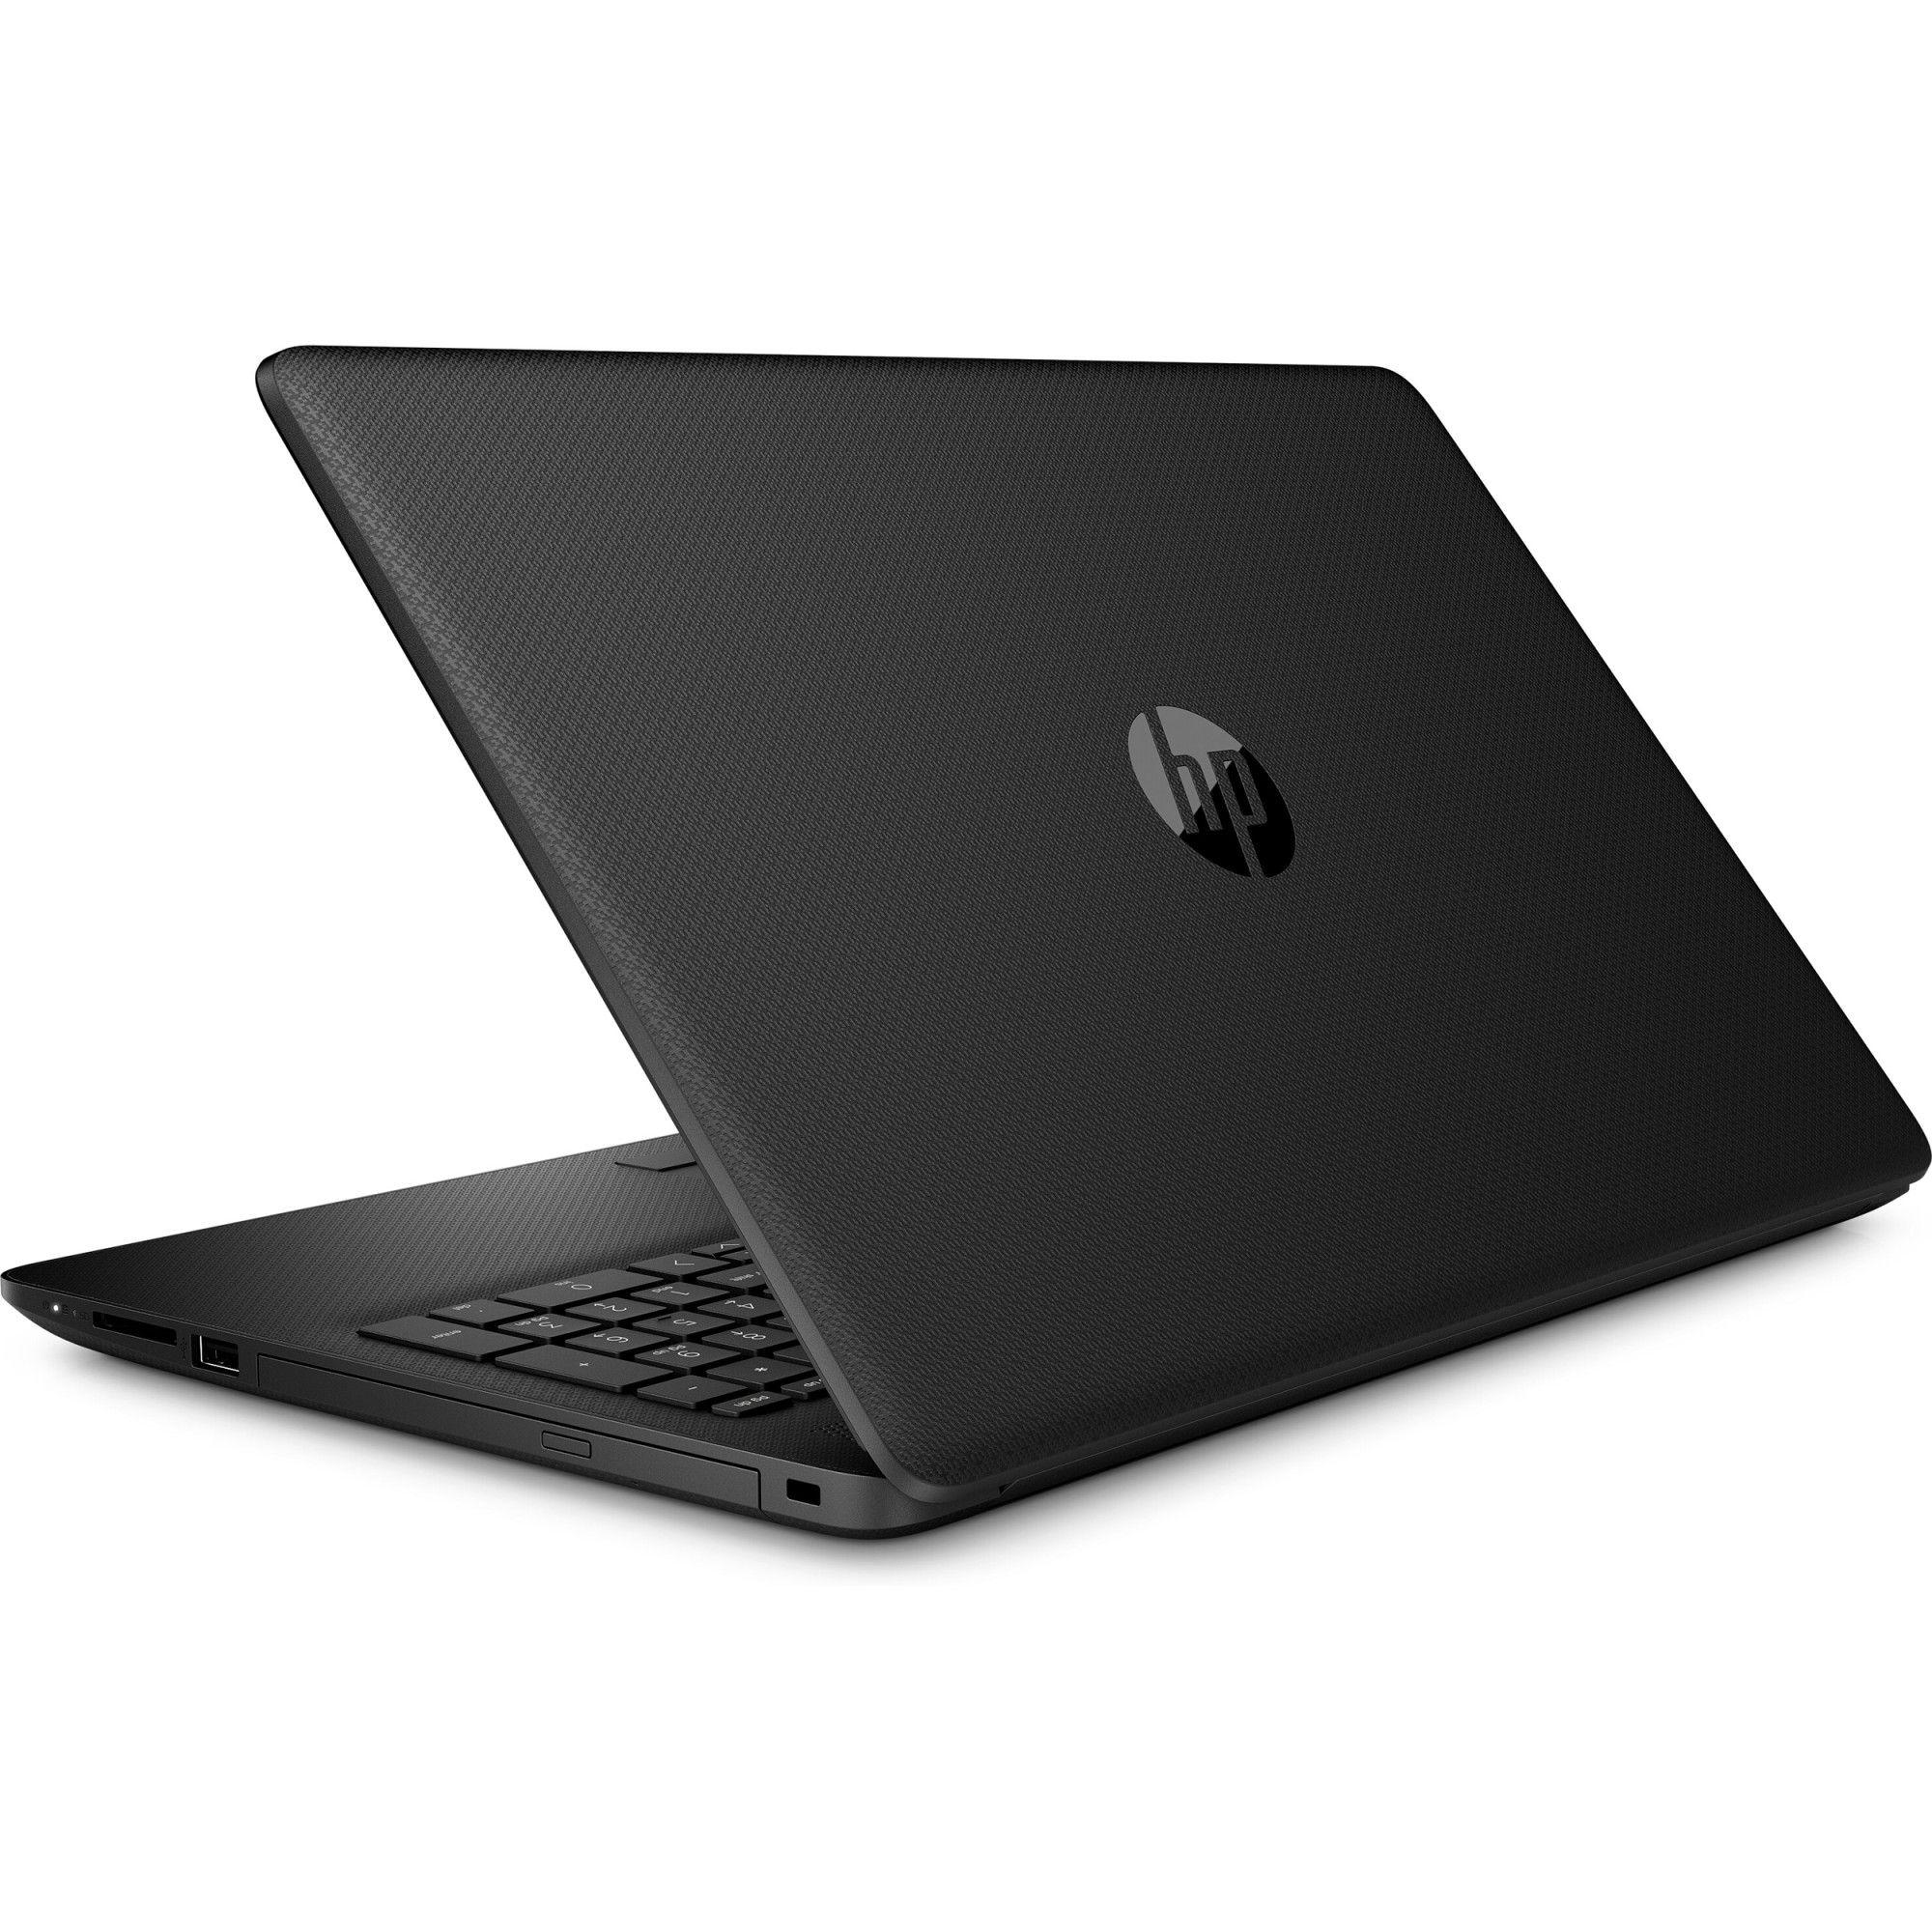 لپ تاپ 15 اینچی اچ پی مدل db1012nq - A main 1 4